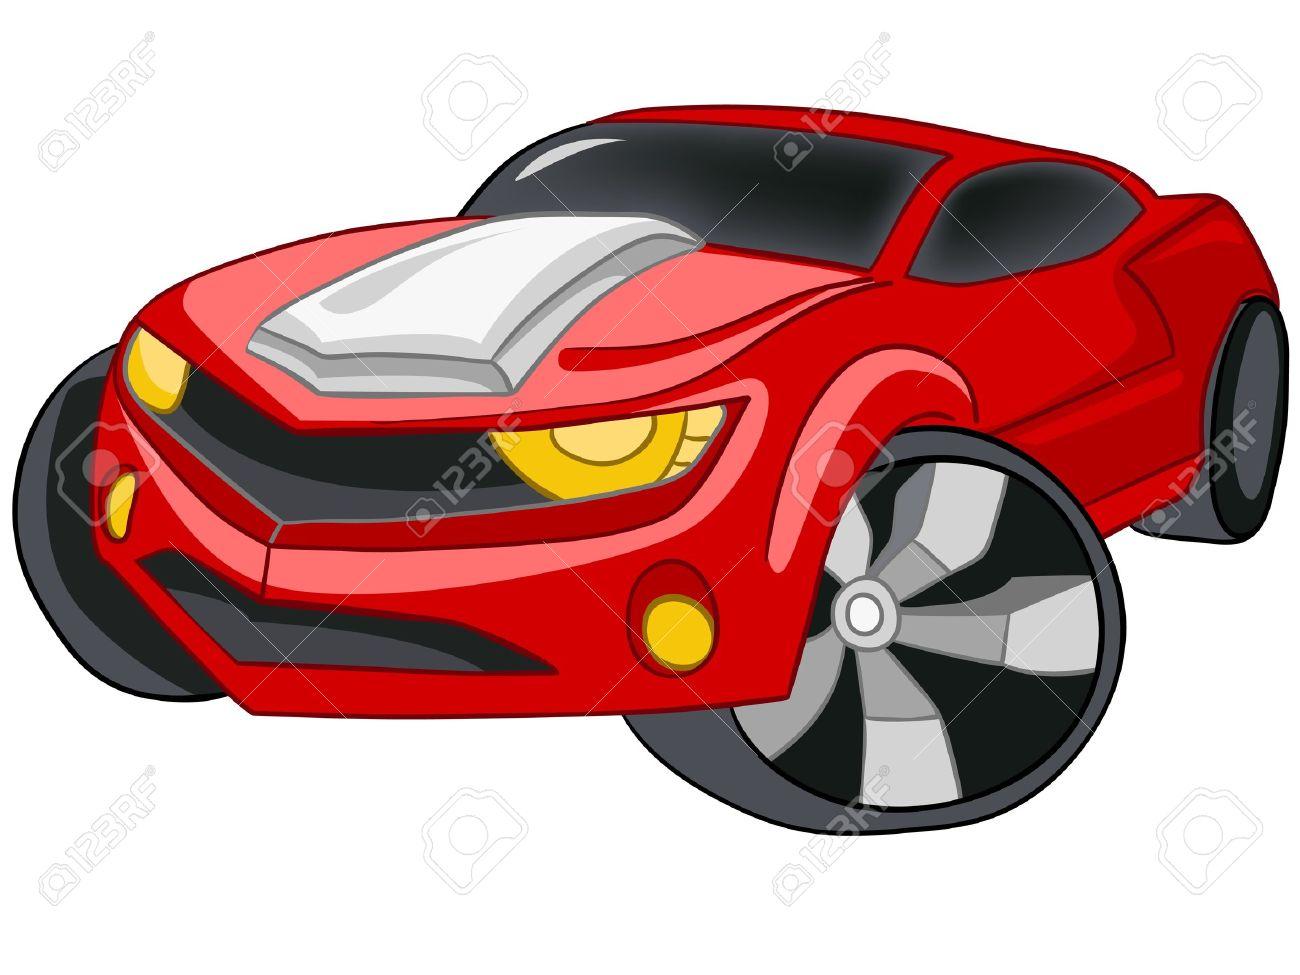 Cartoon Car Stock Vector - 12043693